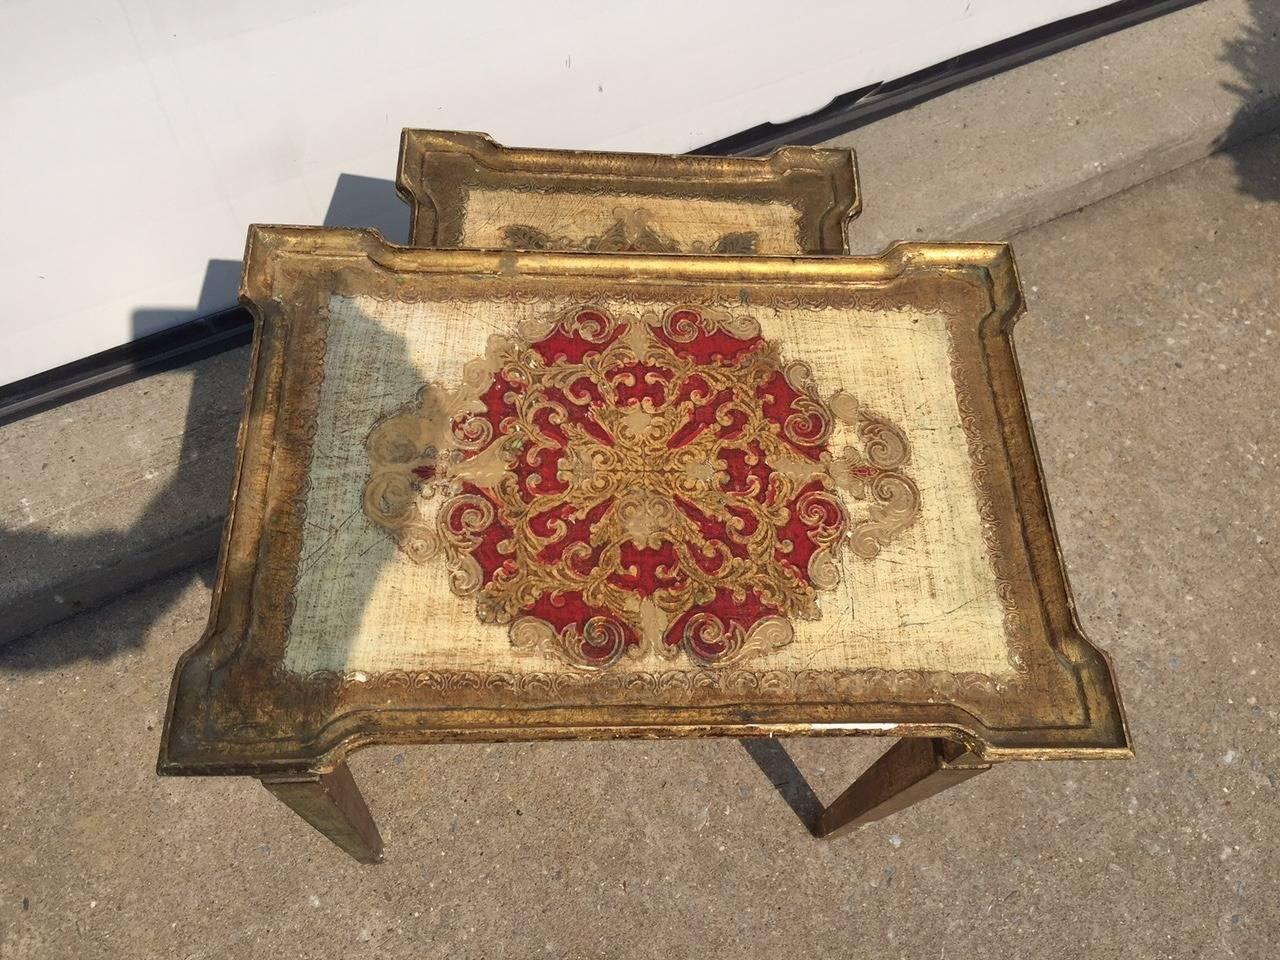 Early 1900s Italian Gilt Nesting Tables, Polychromed For Sale 4